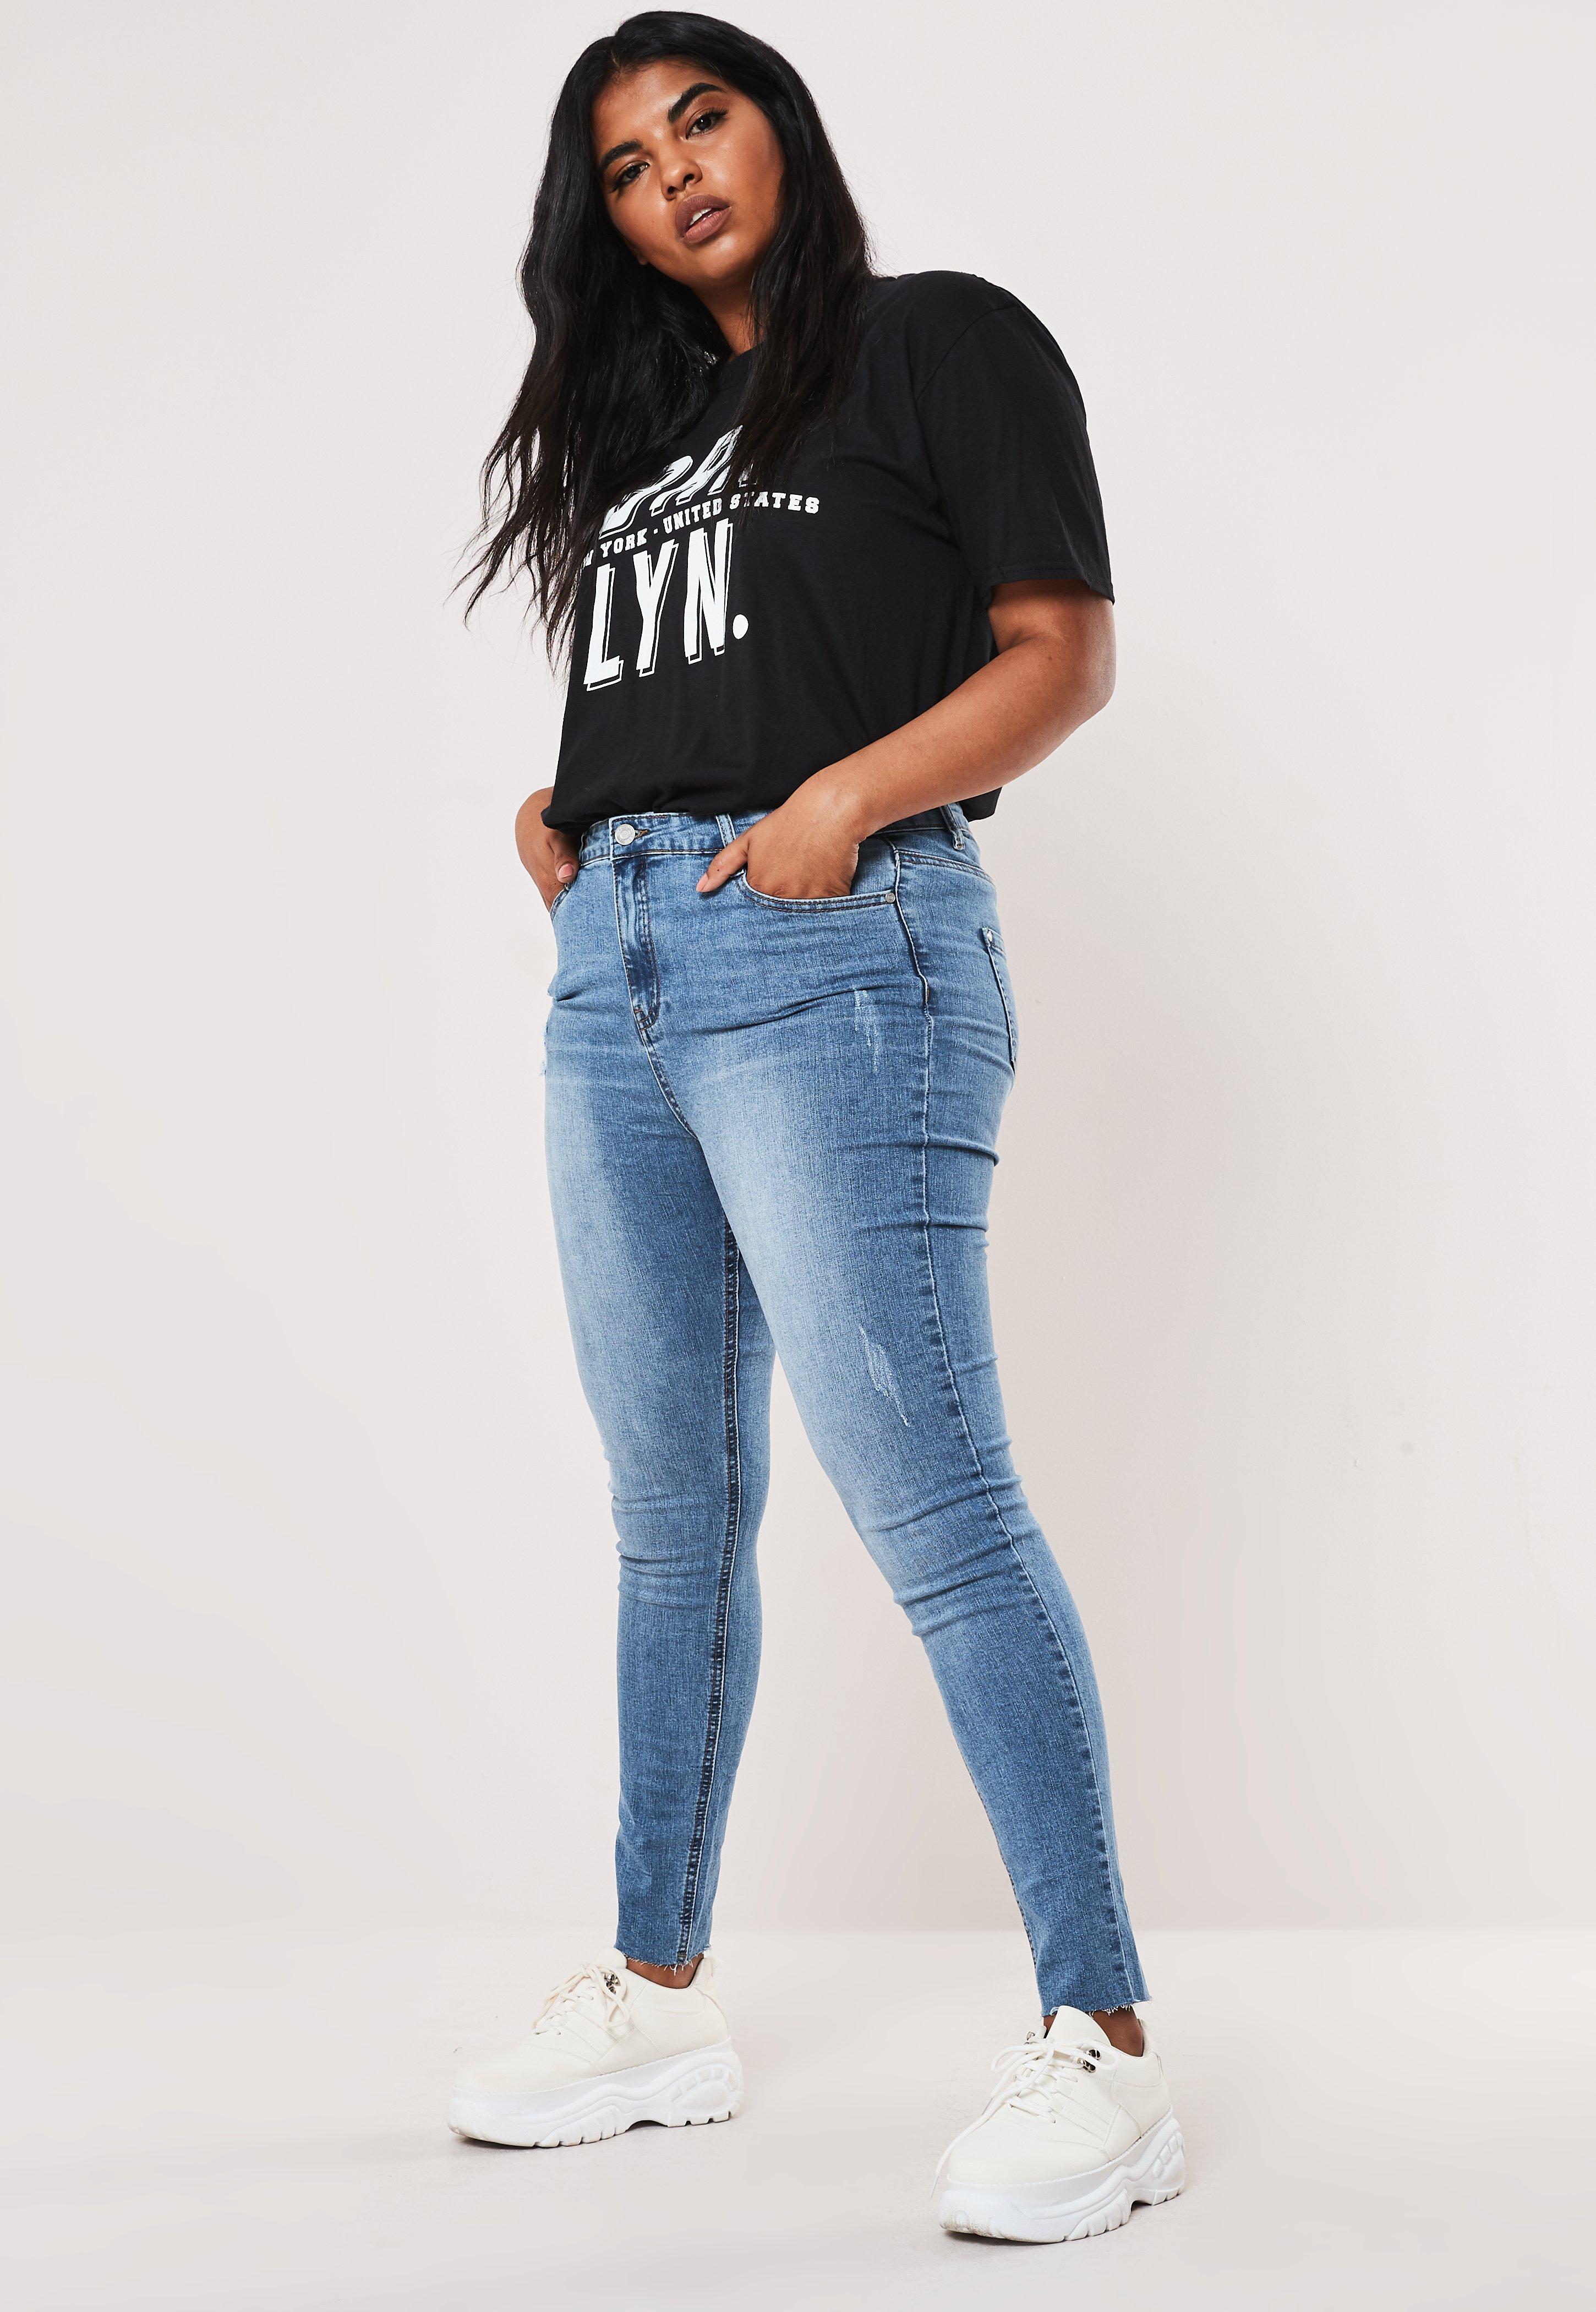 89f1fd9f491 Plus Size Clothing